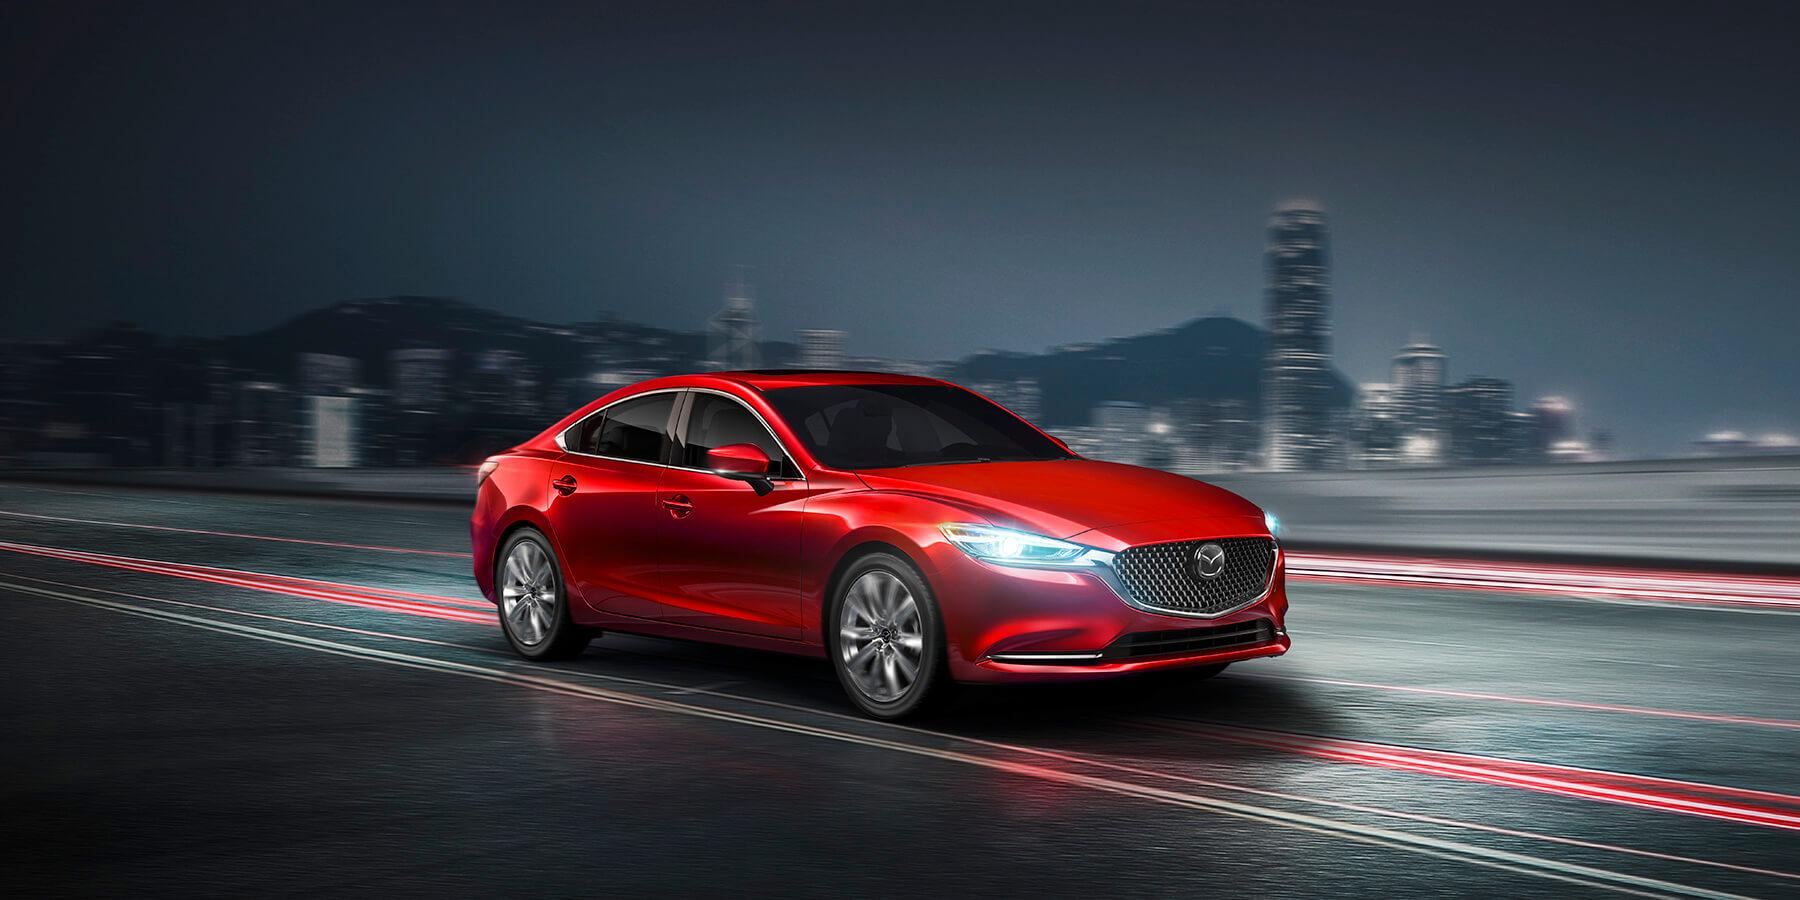 New Mazda6 SDN GTX 2.5L Turbo CA 6AT